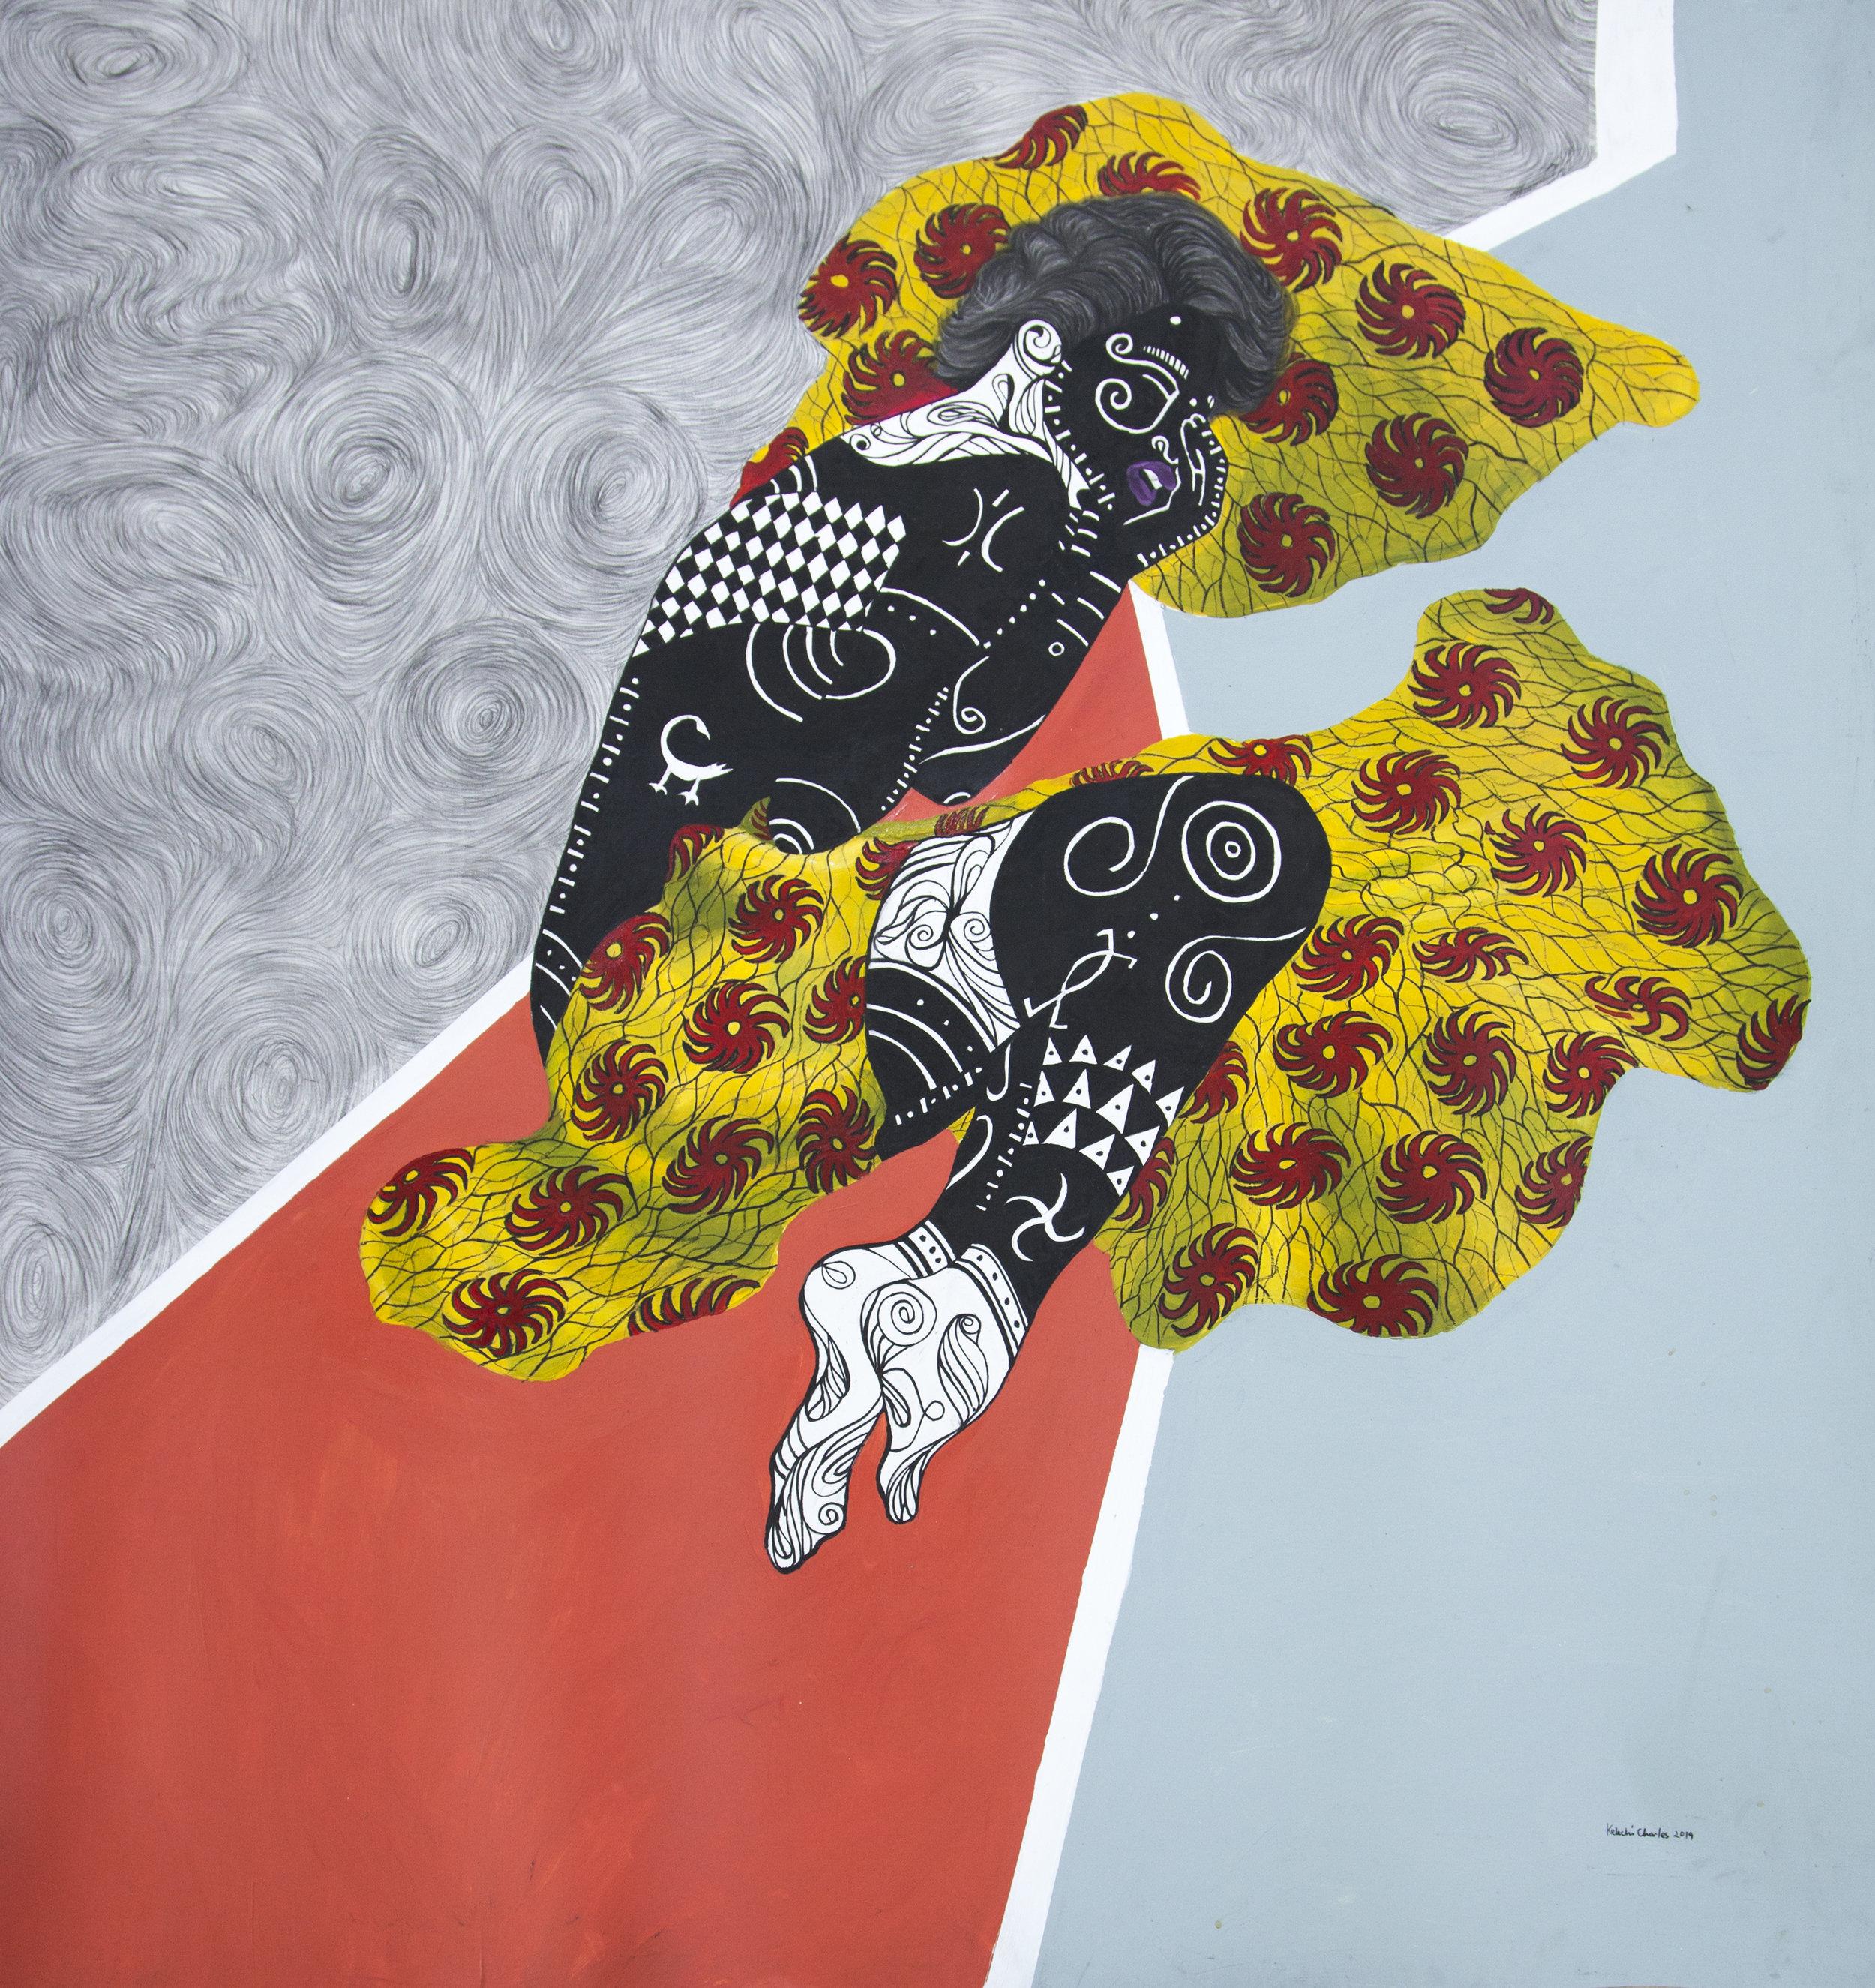 Broken, Acrylic and charcoal on Bristol Strathmore paper, 106 x 119 cm, 2019, Kelechi Nwaneri